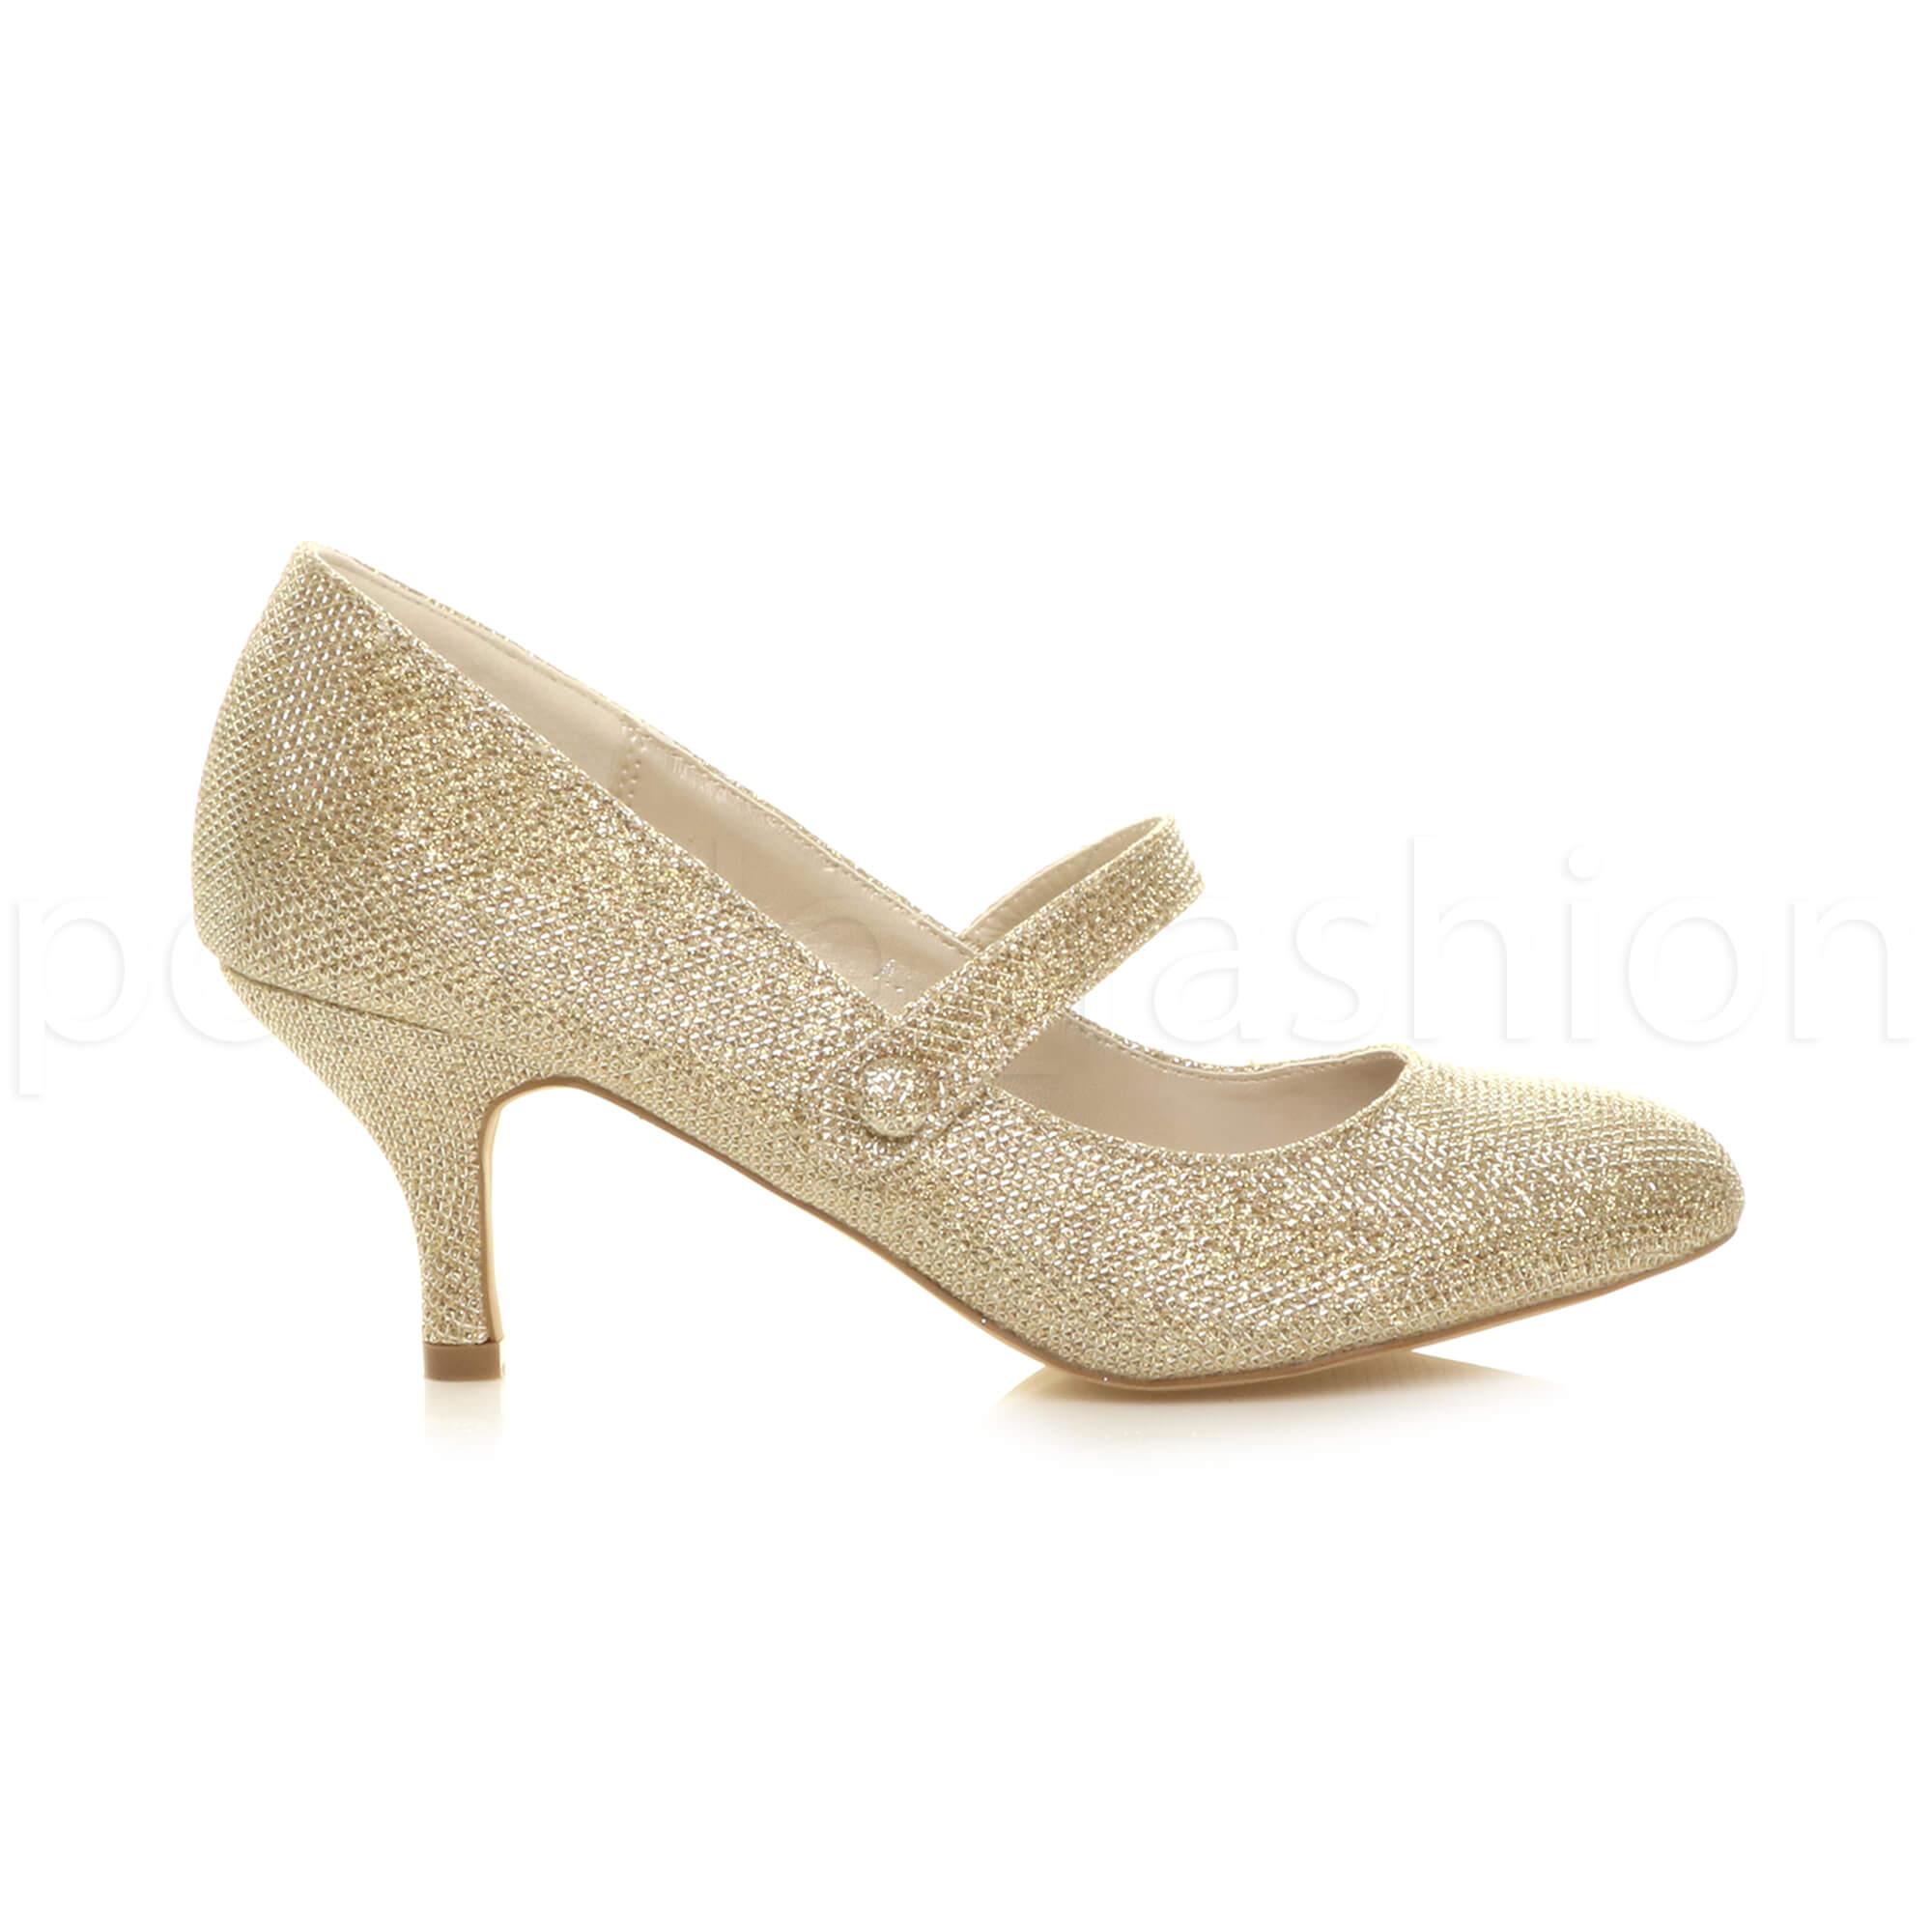 miniatura 73 - Donna basso tacco medio Mary Jane Damigella Matrimonio Pompe Scarpe Da Sera Taglia